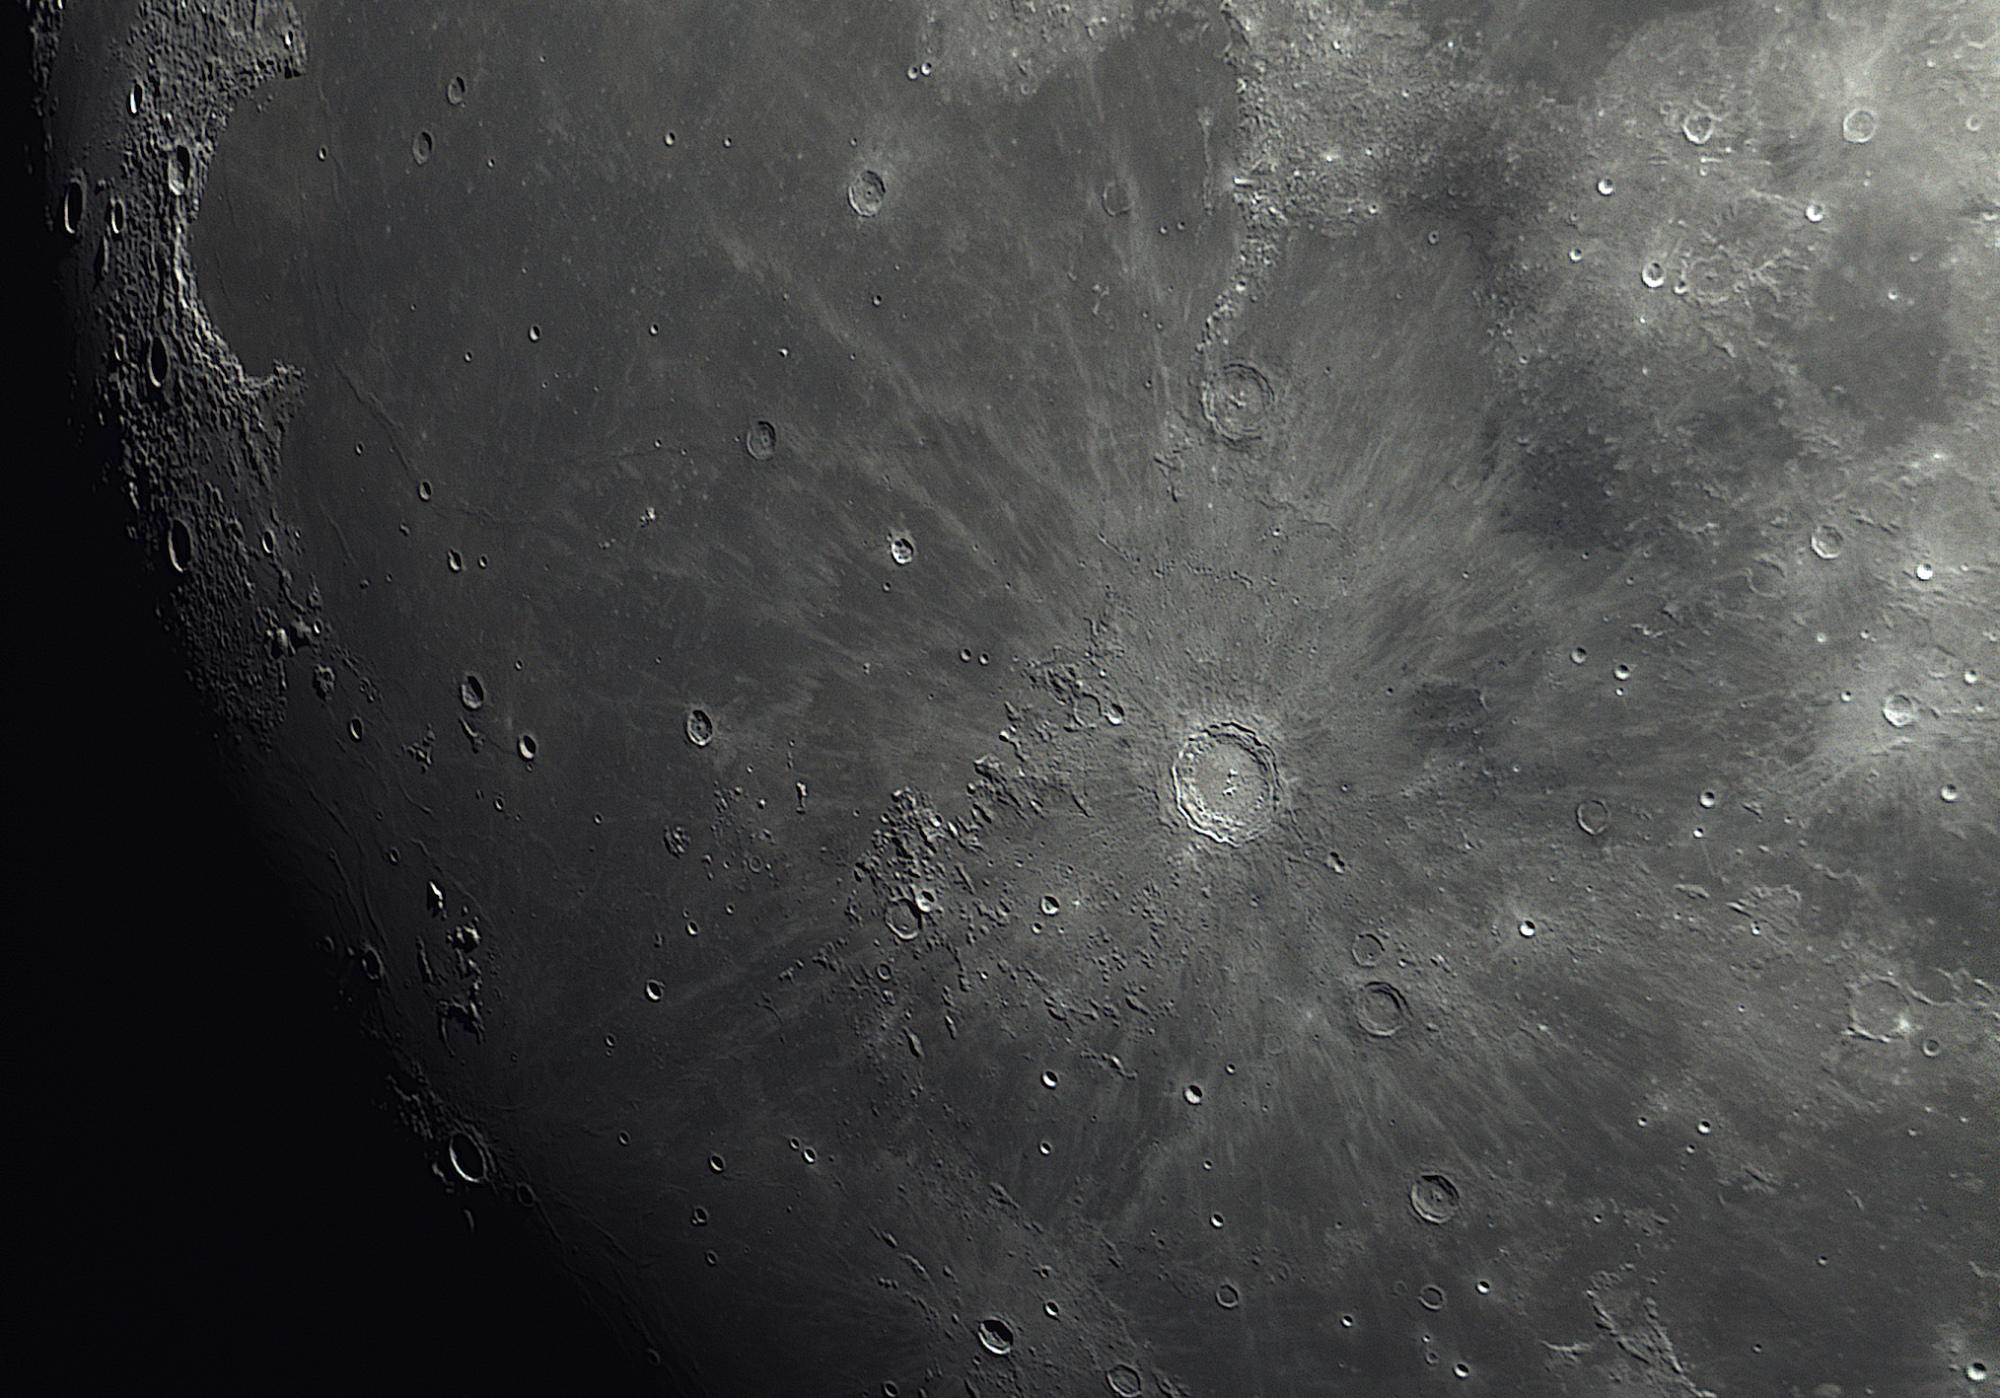 5ce014d33f402_Copernic10.thumb.jpg.6d057b60ff5902b1d20808c668923965.jpg